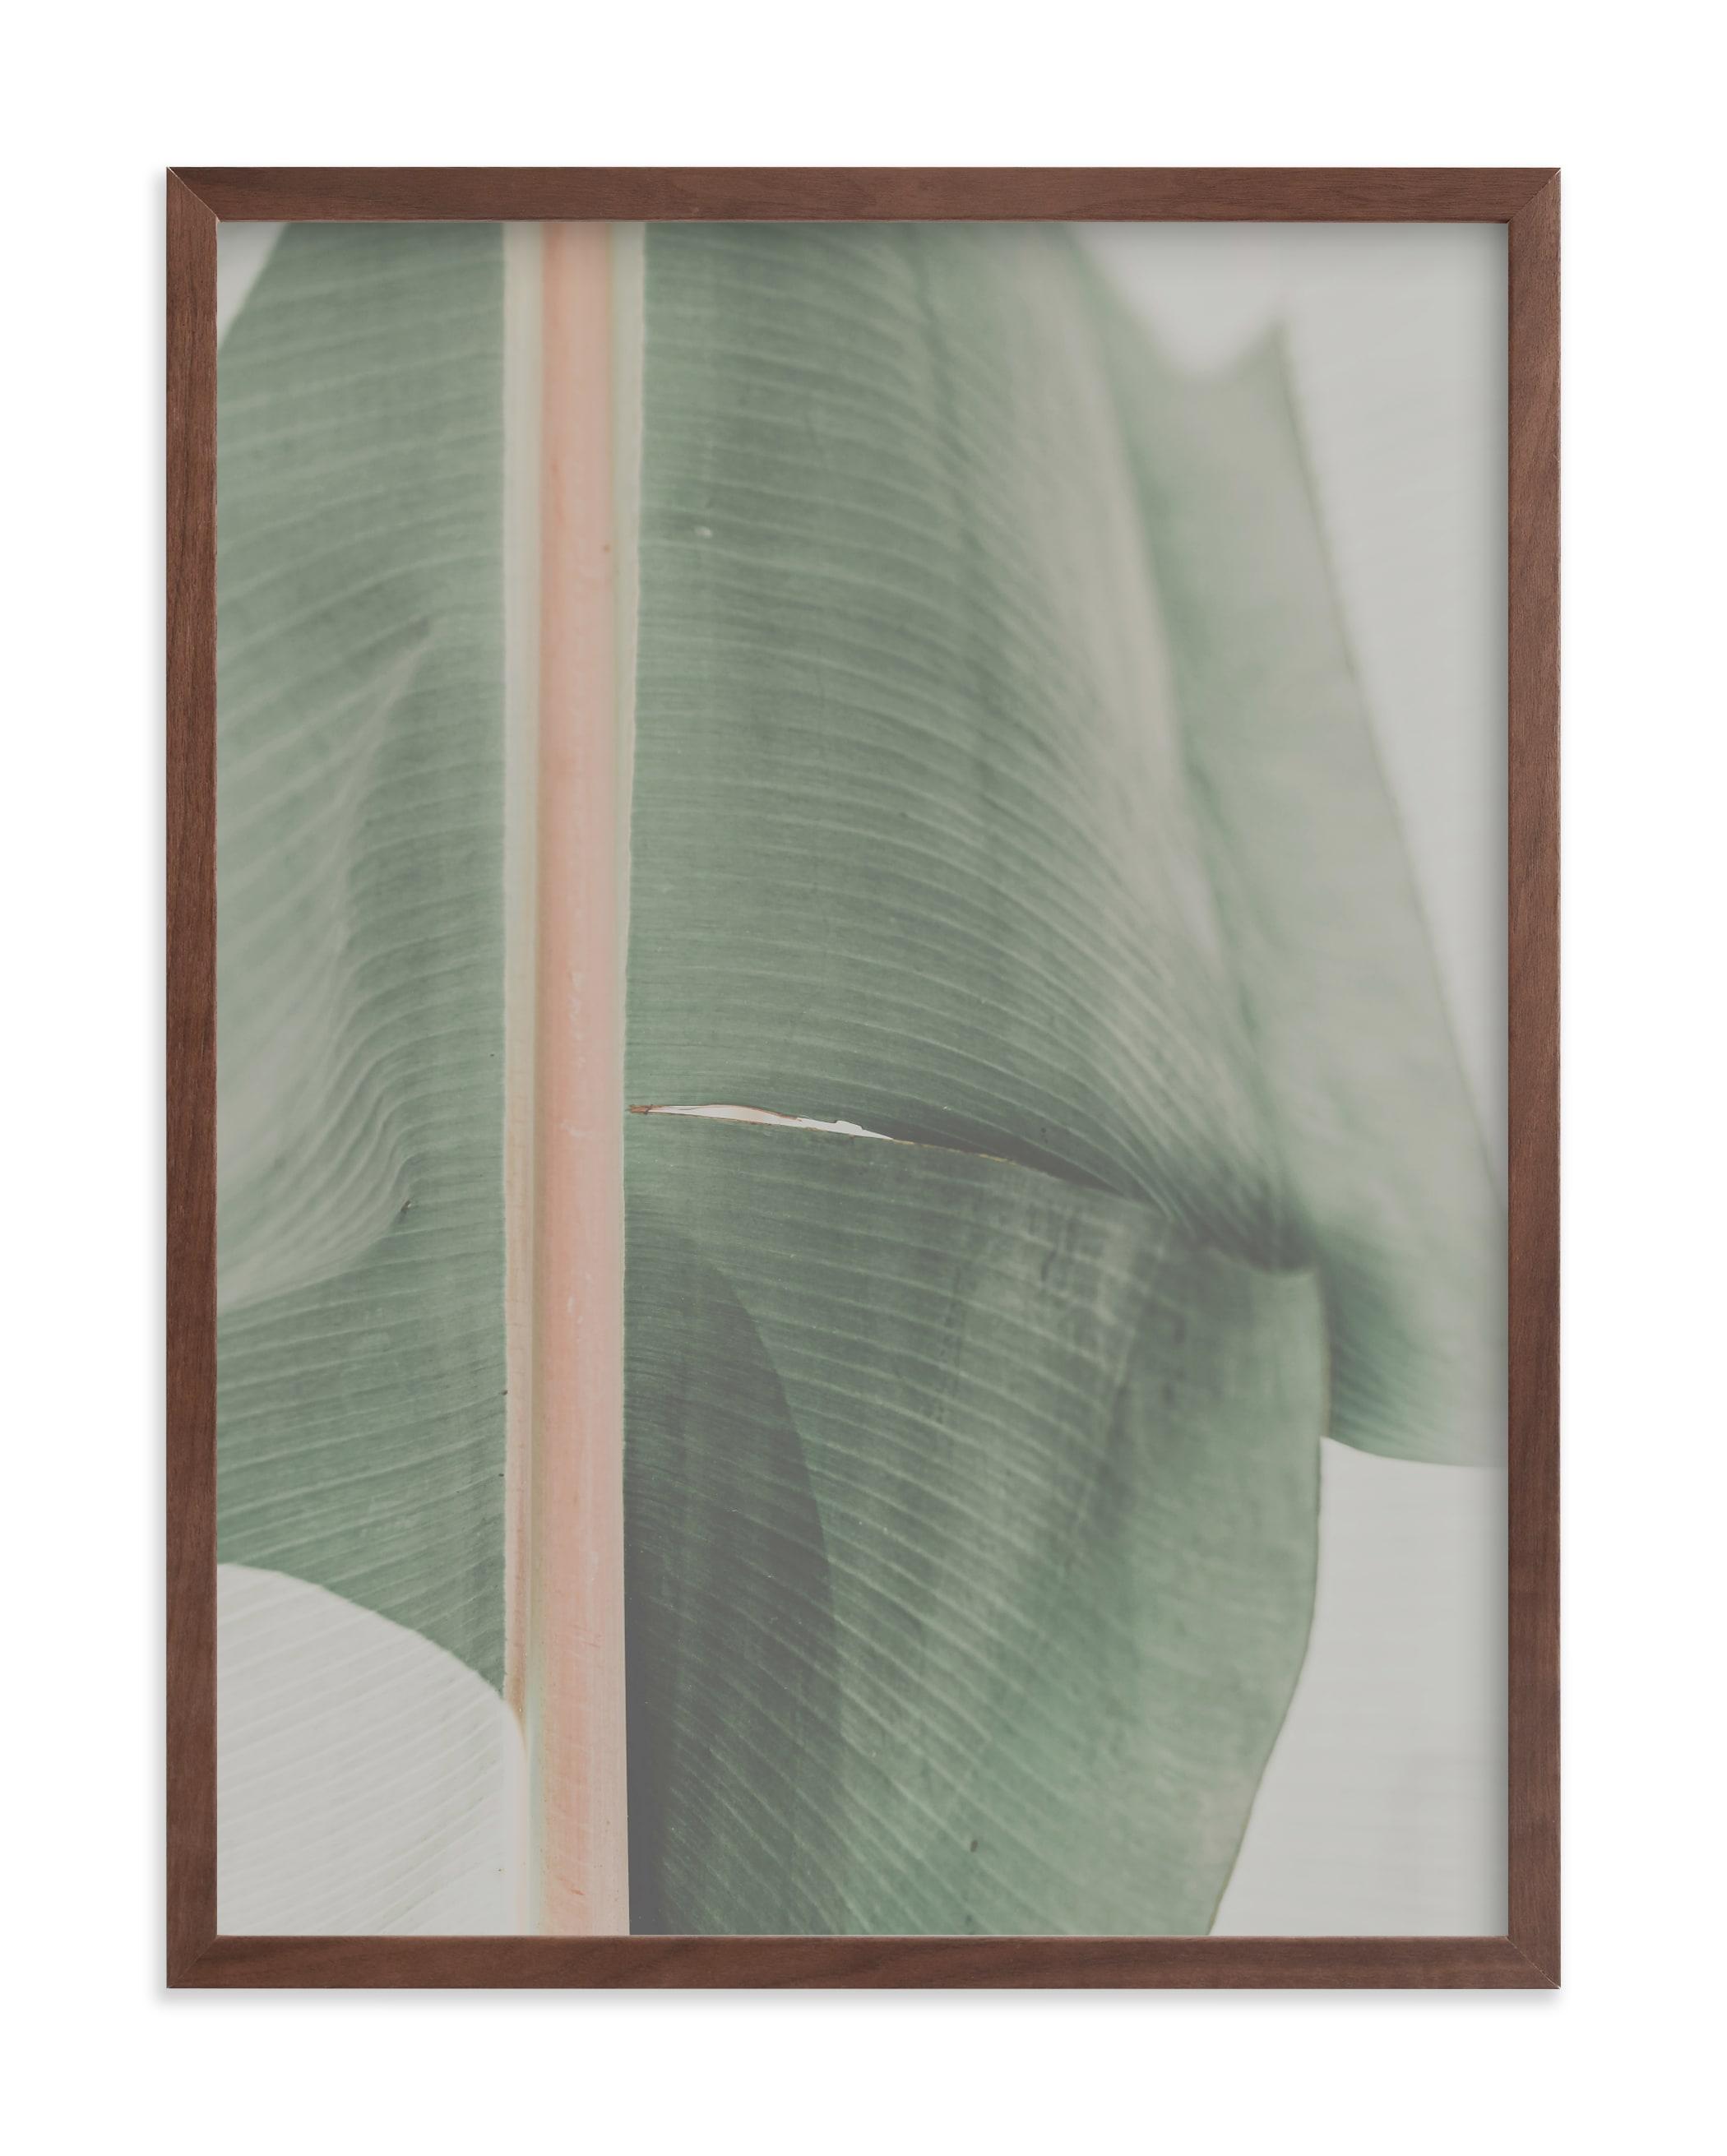 This is a grey art by Alicia Abla called rainforest leaf.